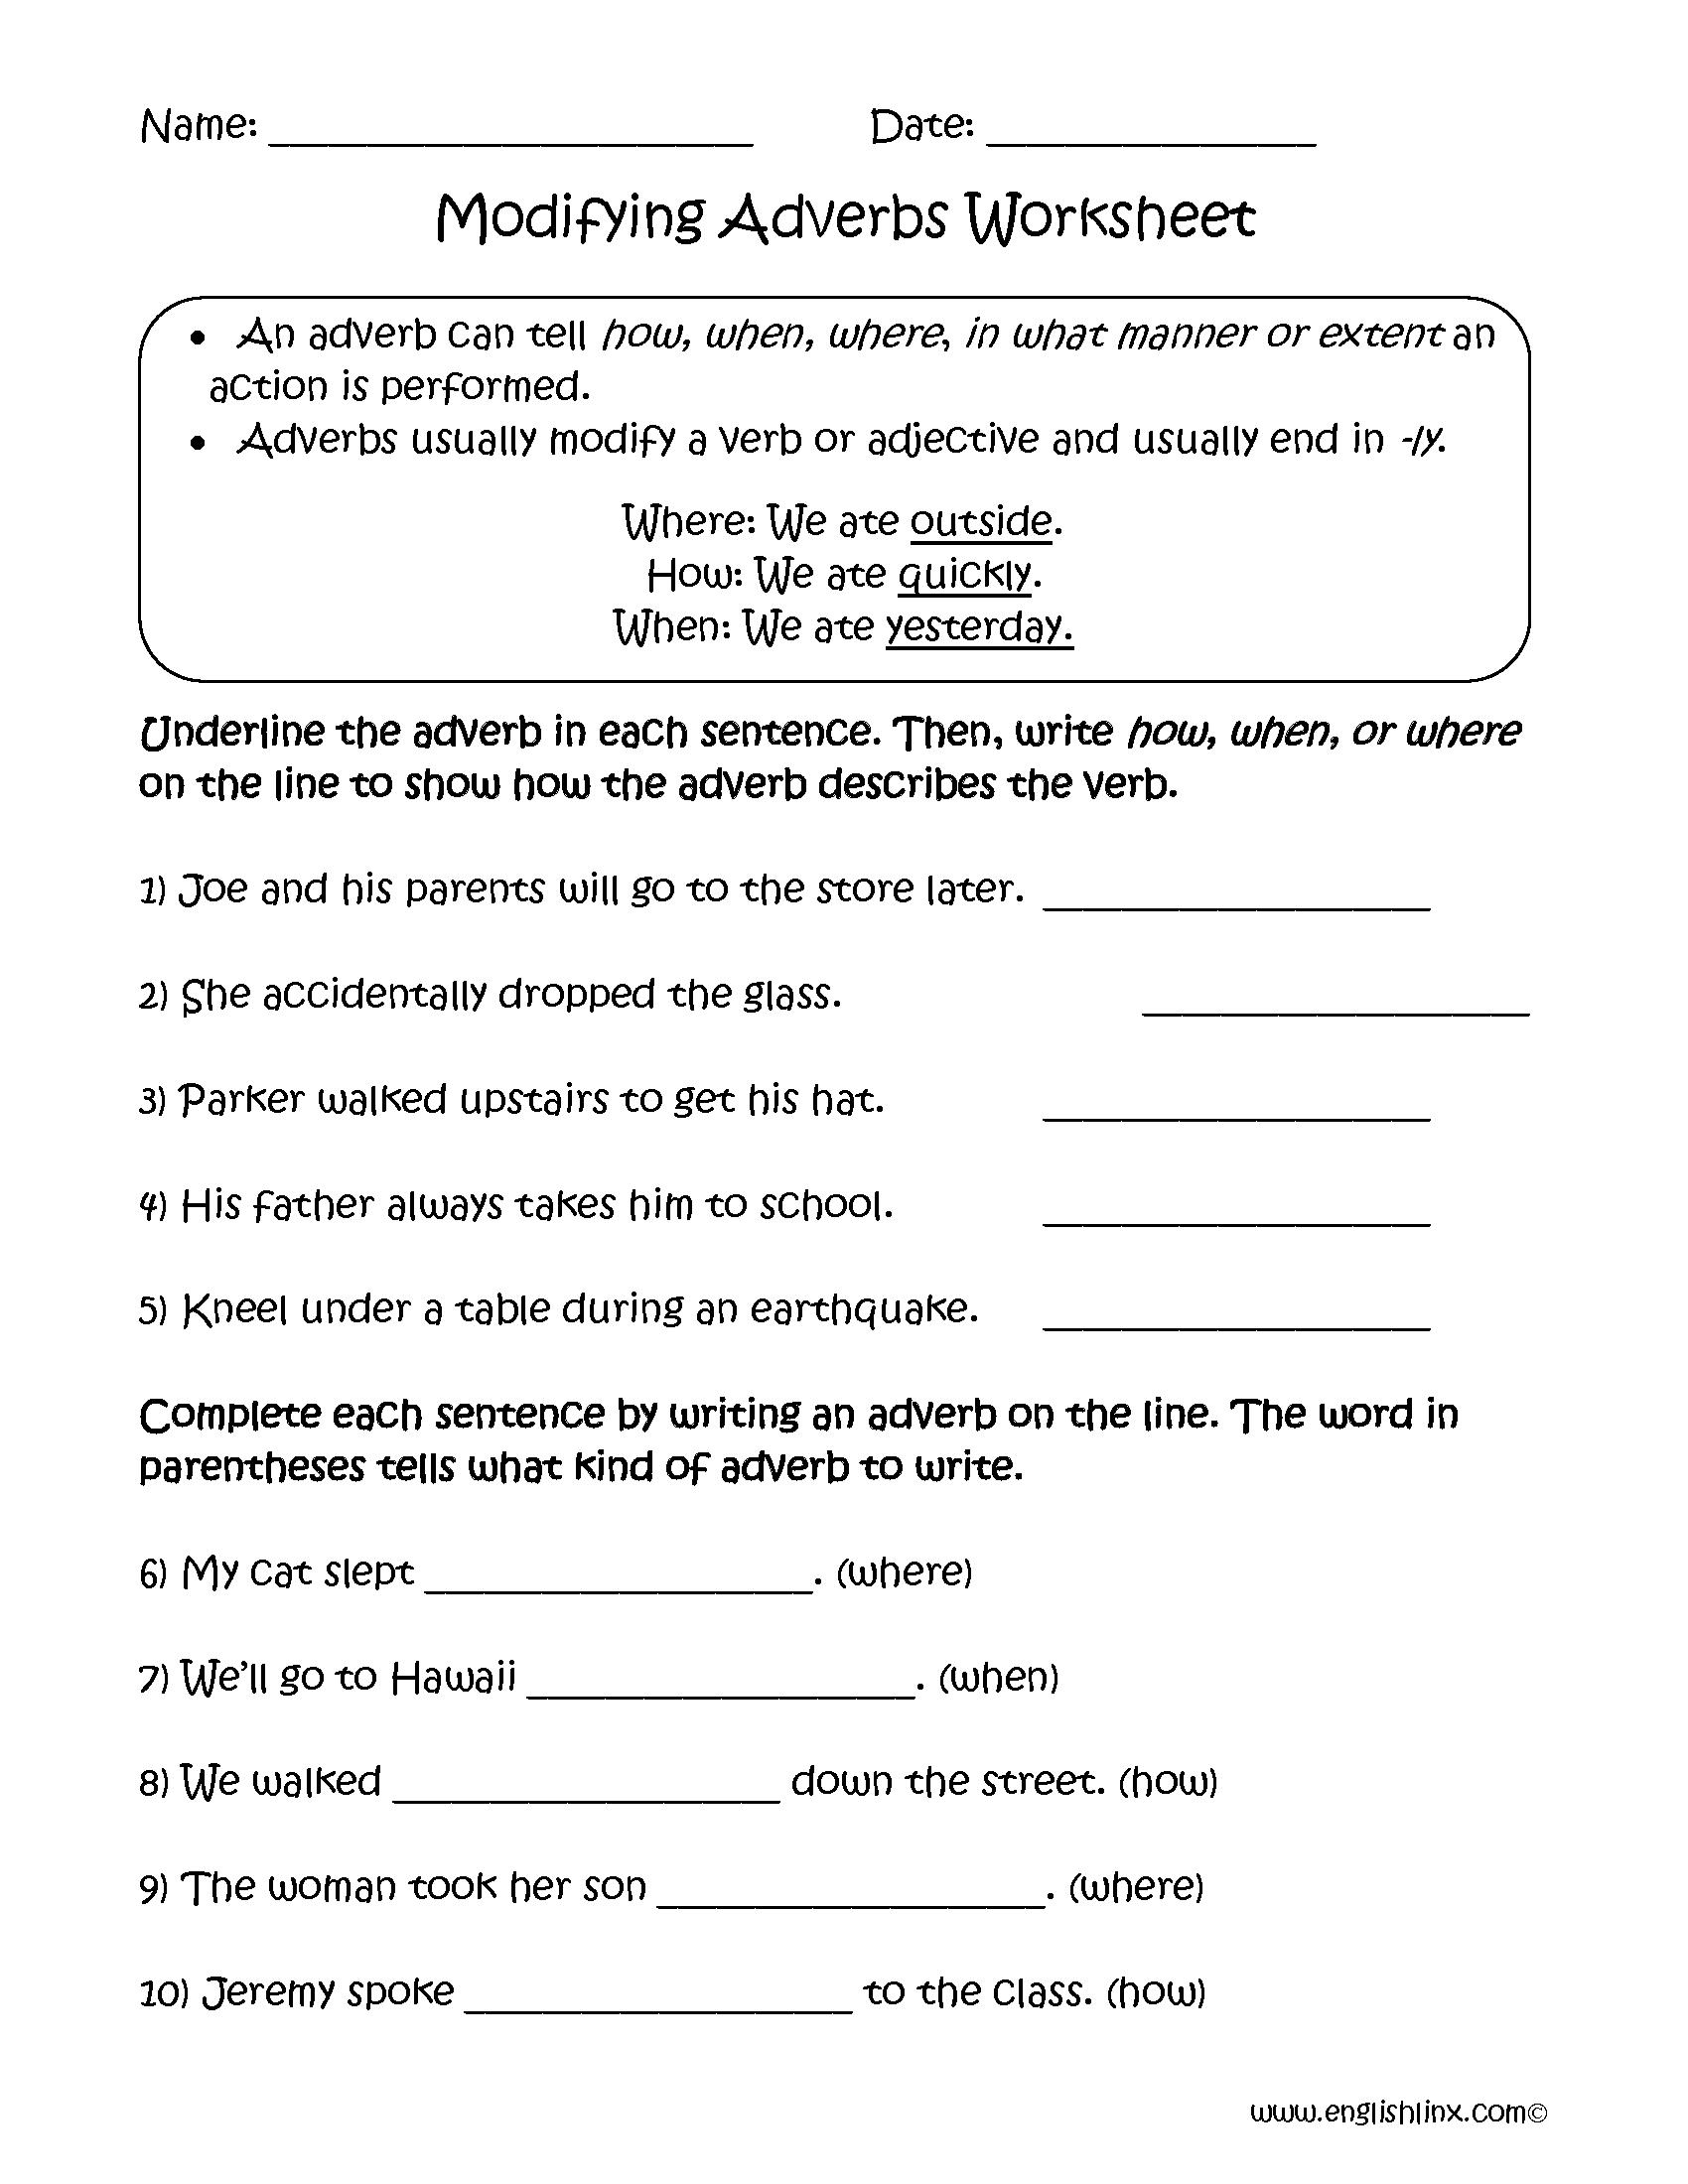 medium resolution of Adverbs Worksheets   Regular Adverbs Worksheets   Adverbs worksheet